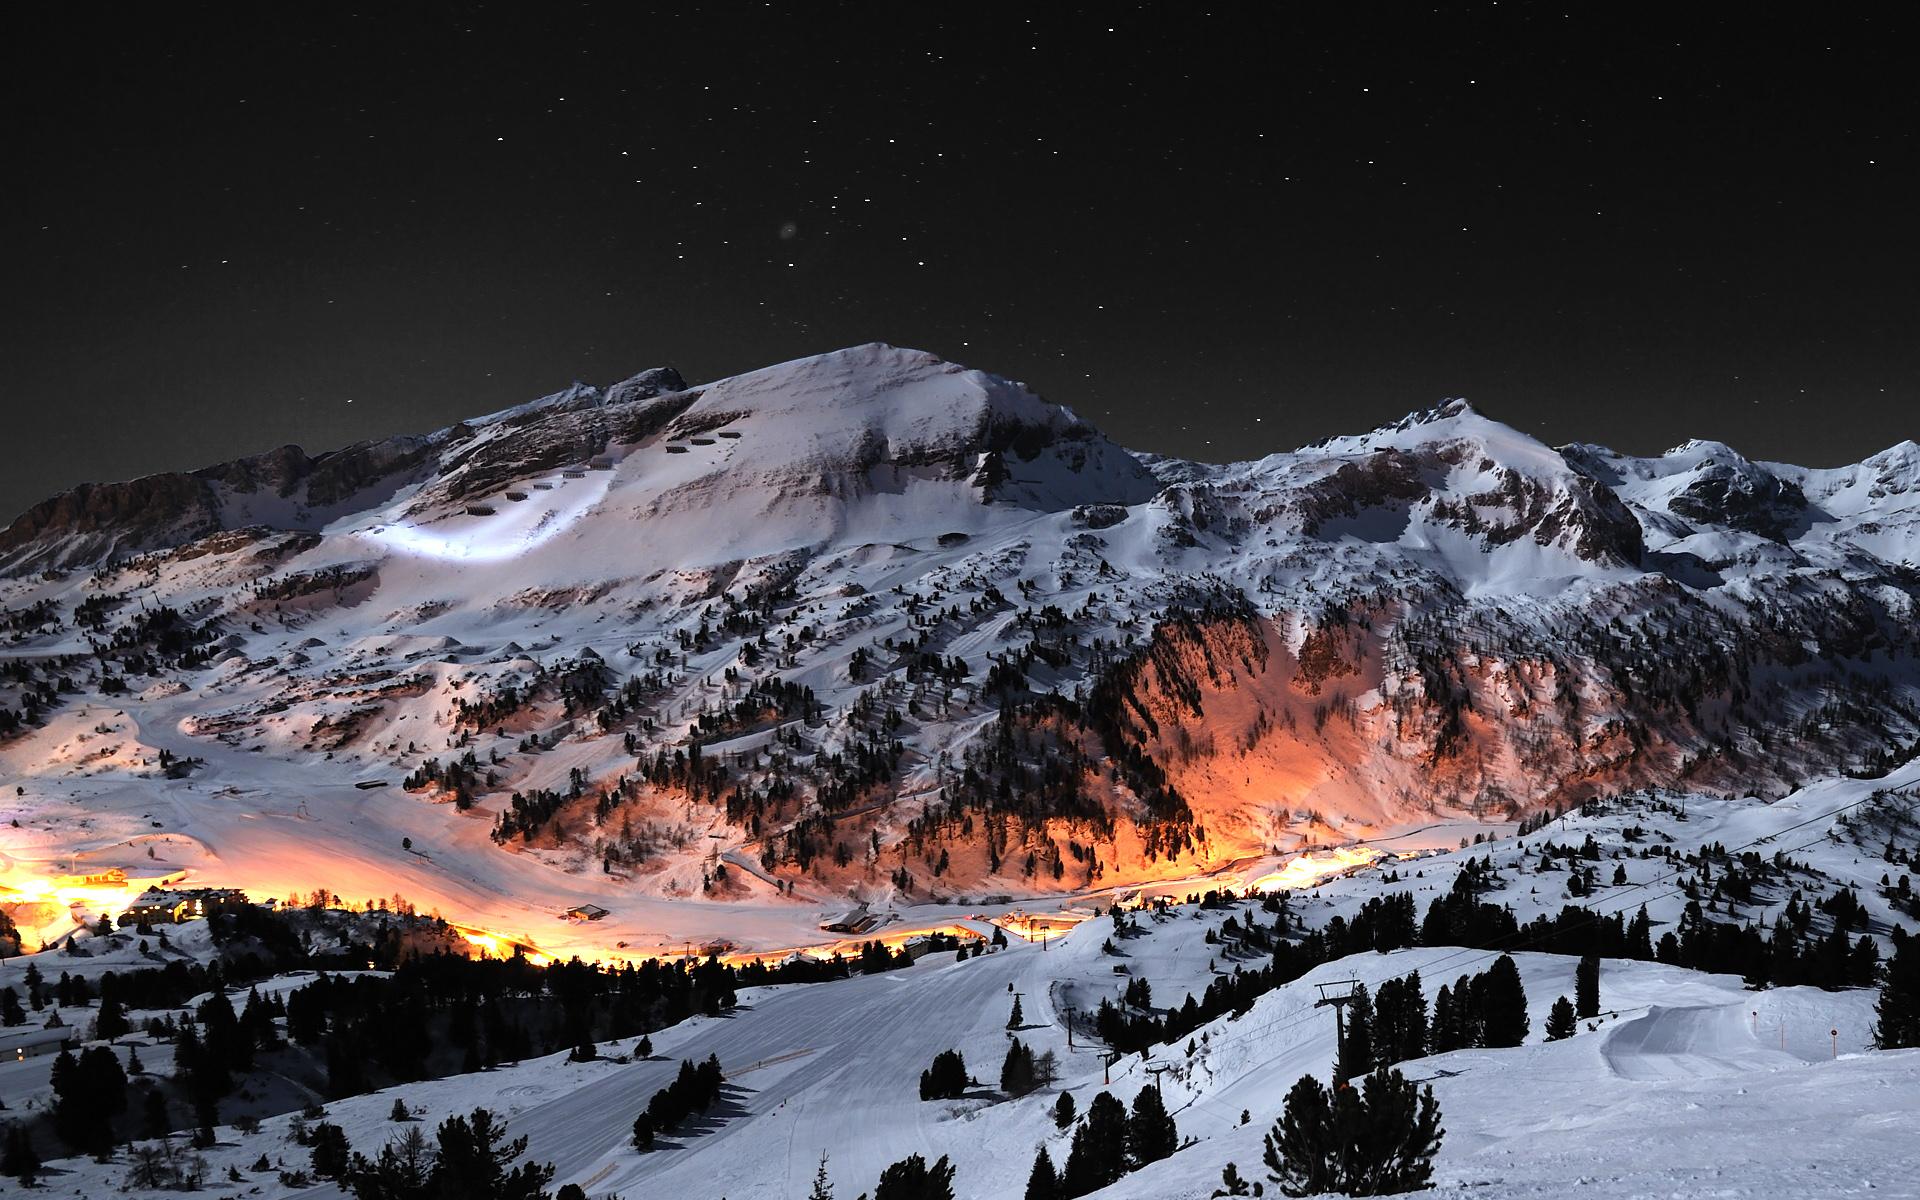 48] Snow Mountain Wallpaper Desktop on WallpaperSafari 1920x1200